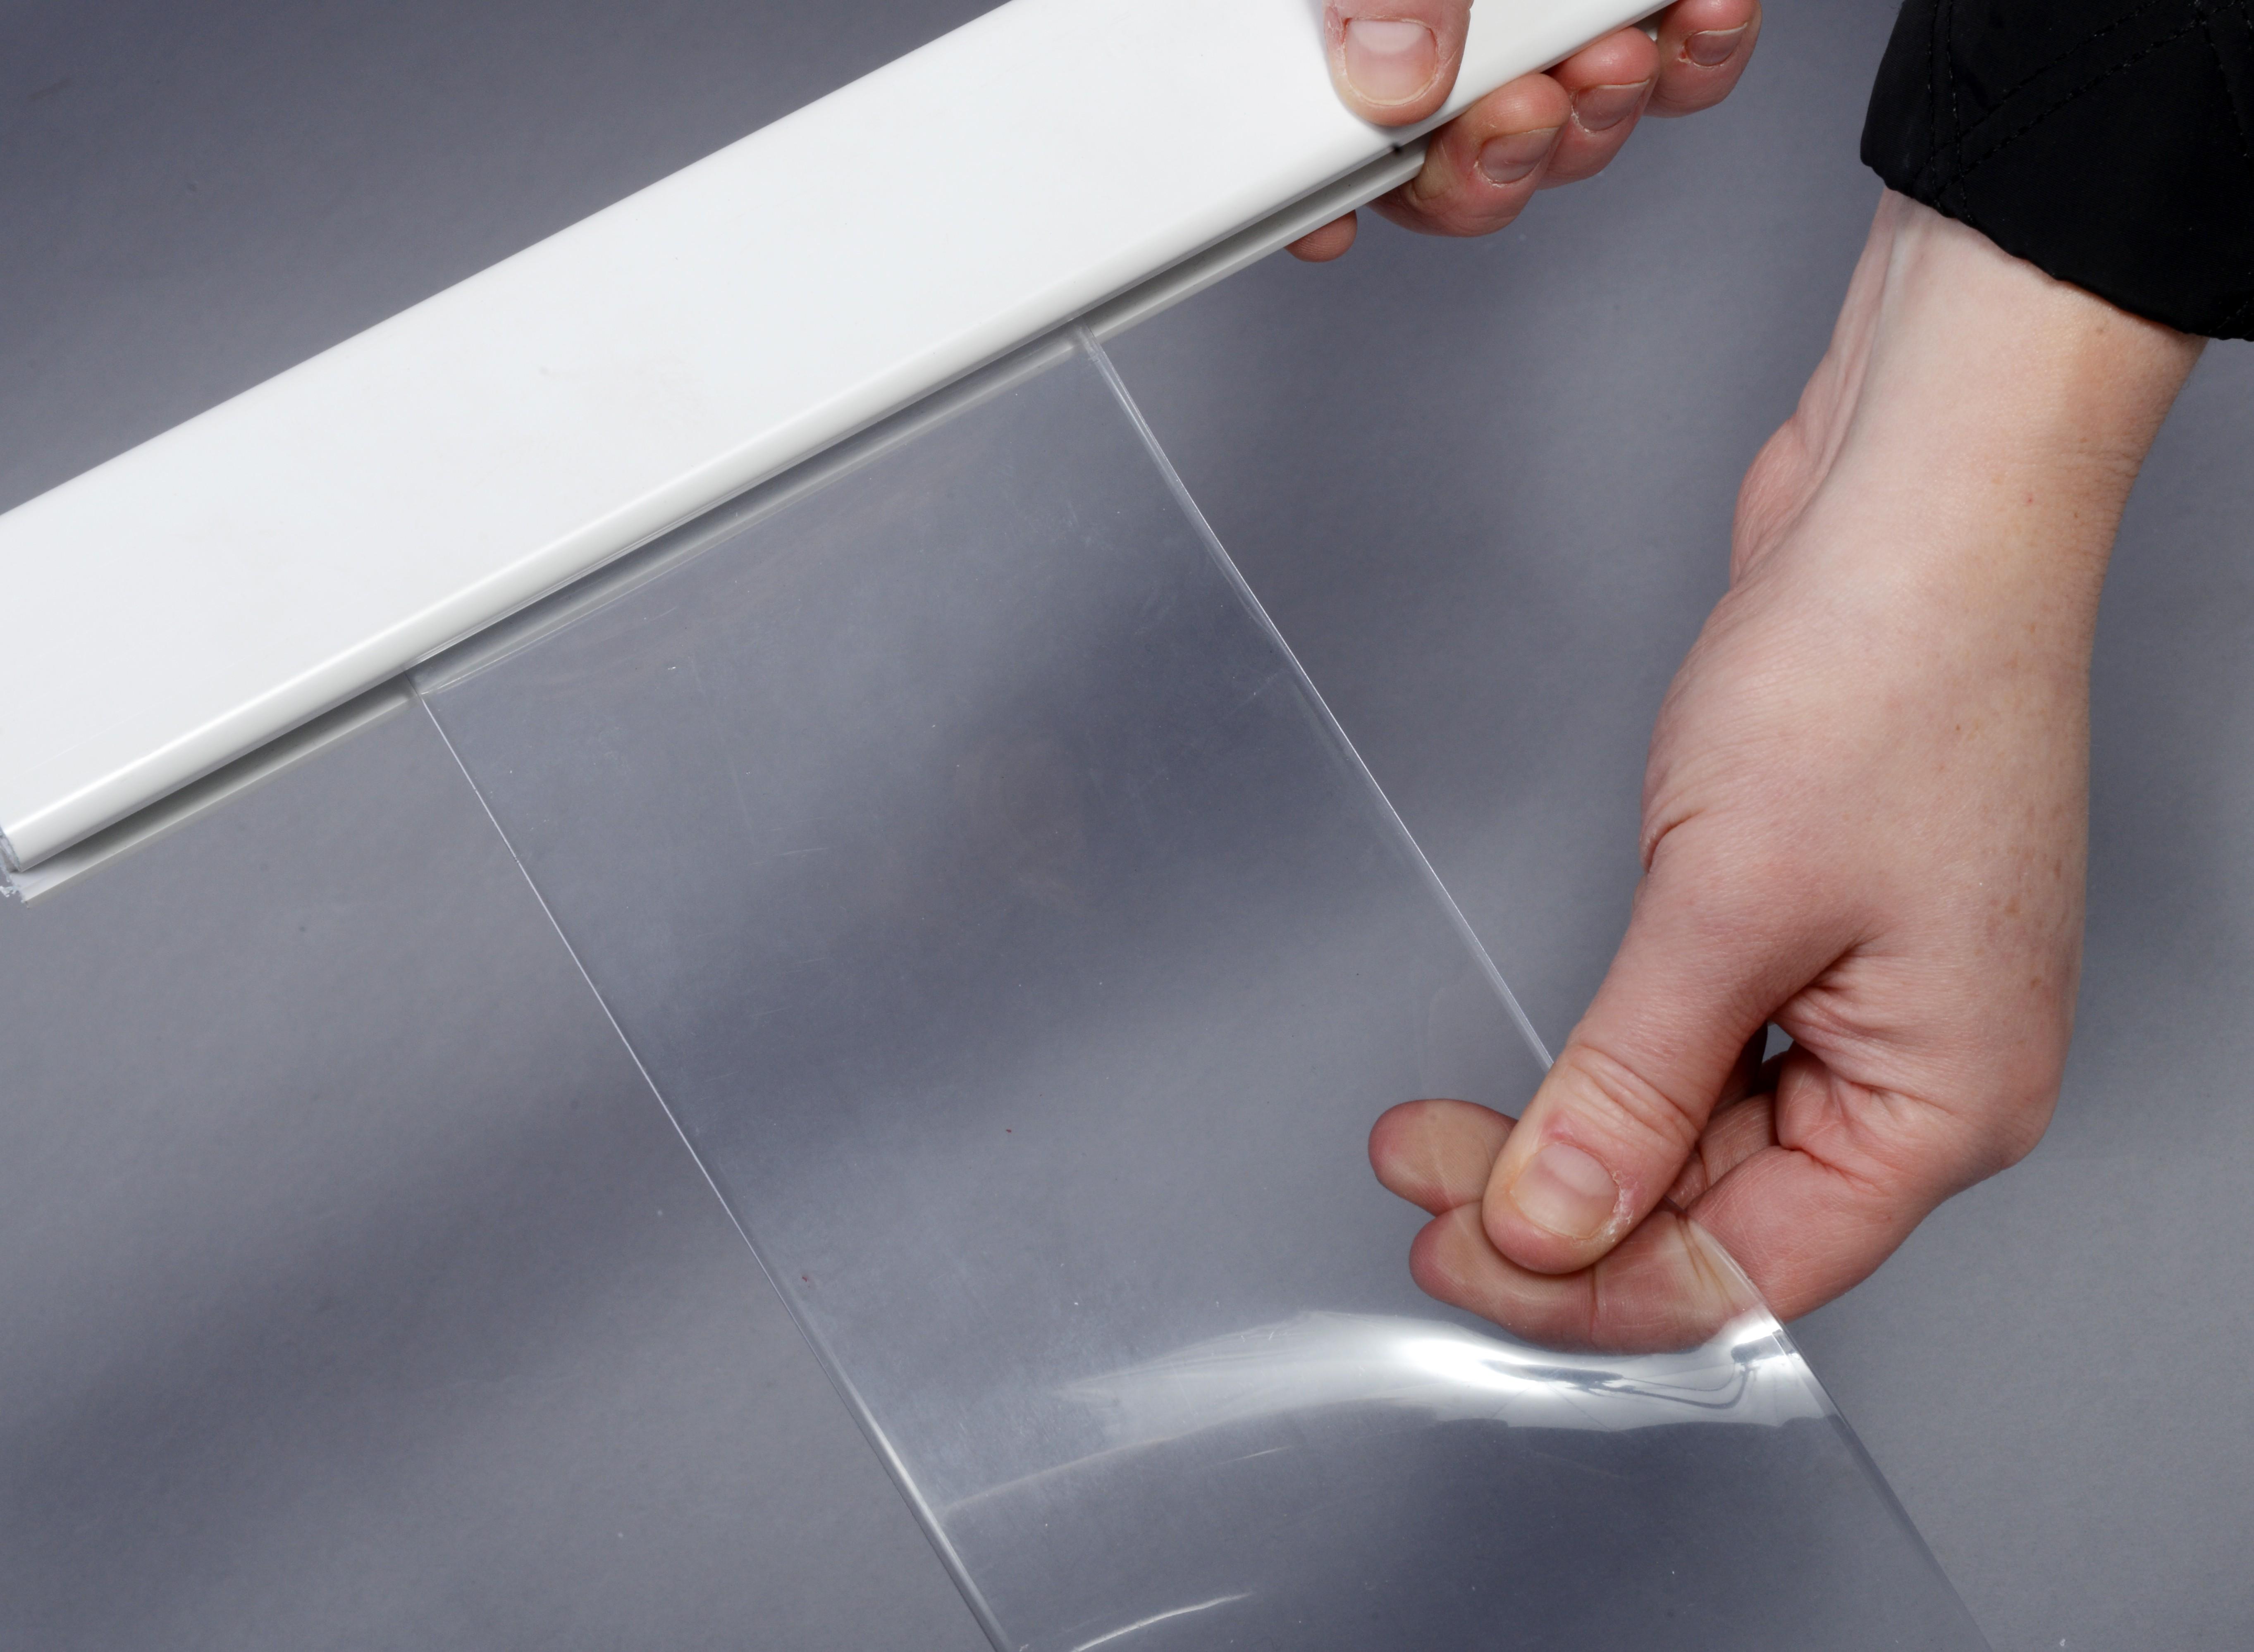 rayflex dual chiller fridge blinds strip pvc fixing freezers g blind fridges fix parts open